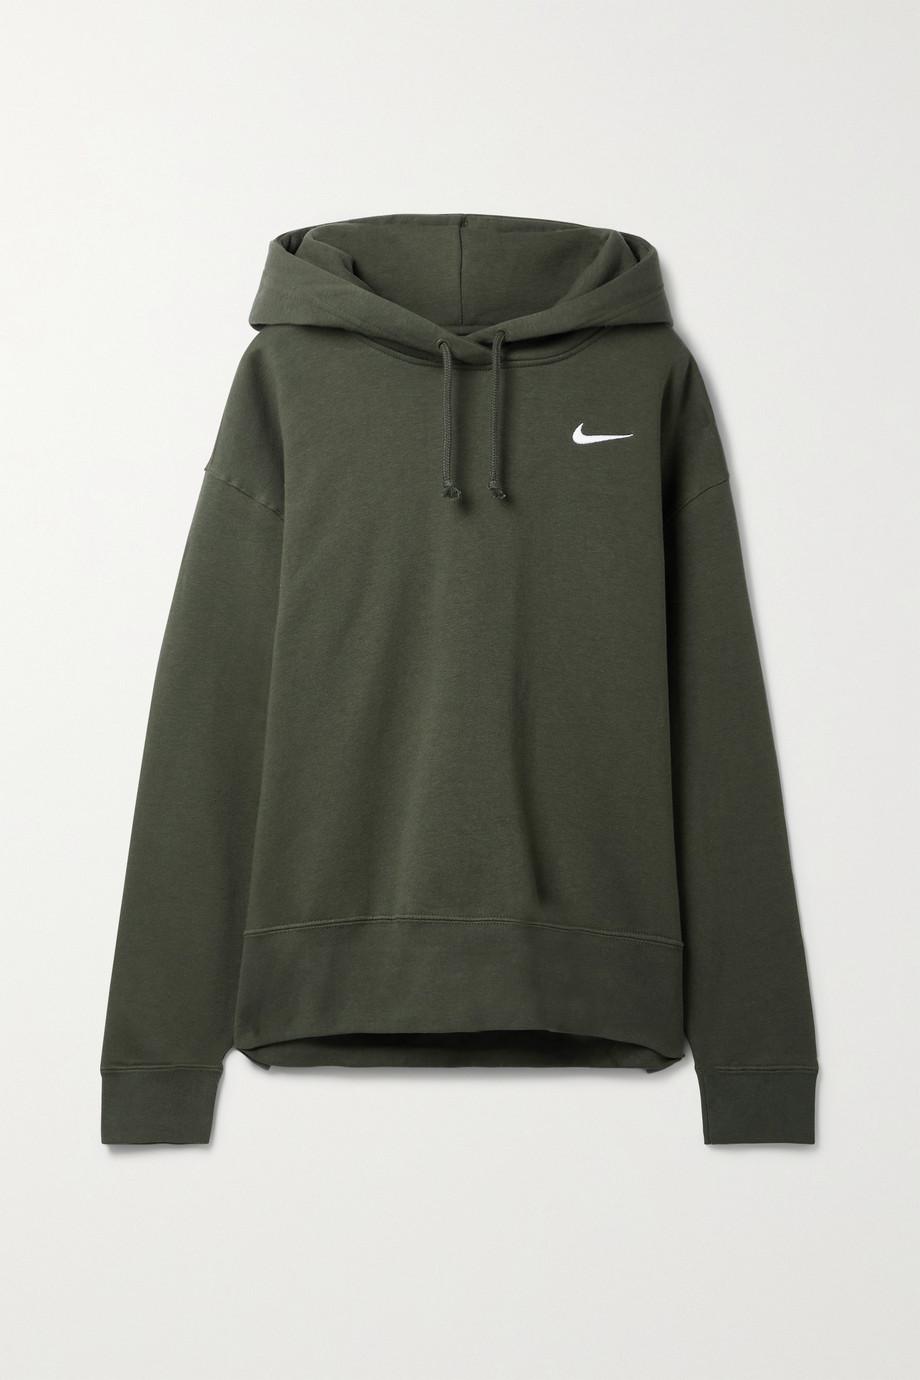 Nike Cotton-blend jersey hoodie